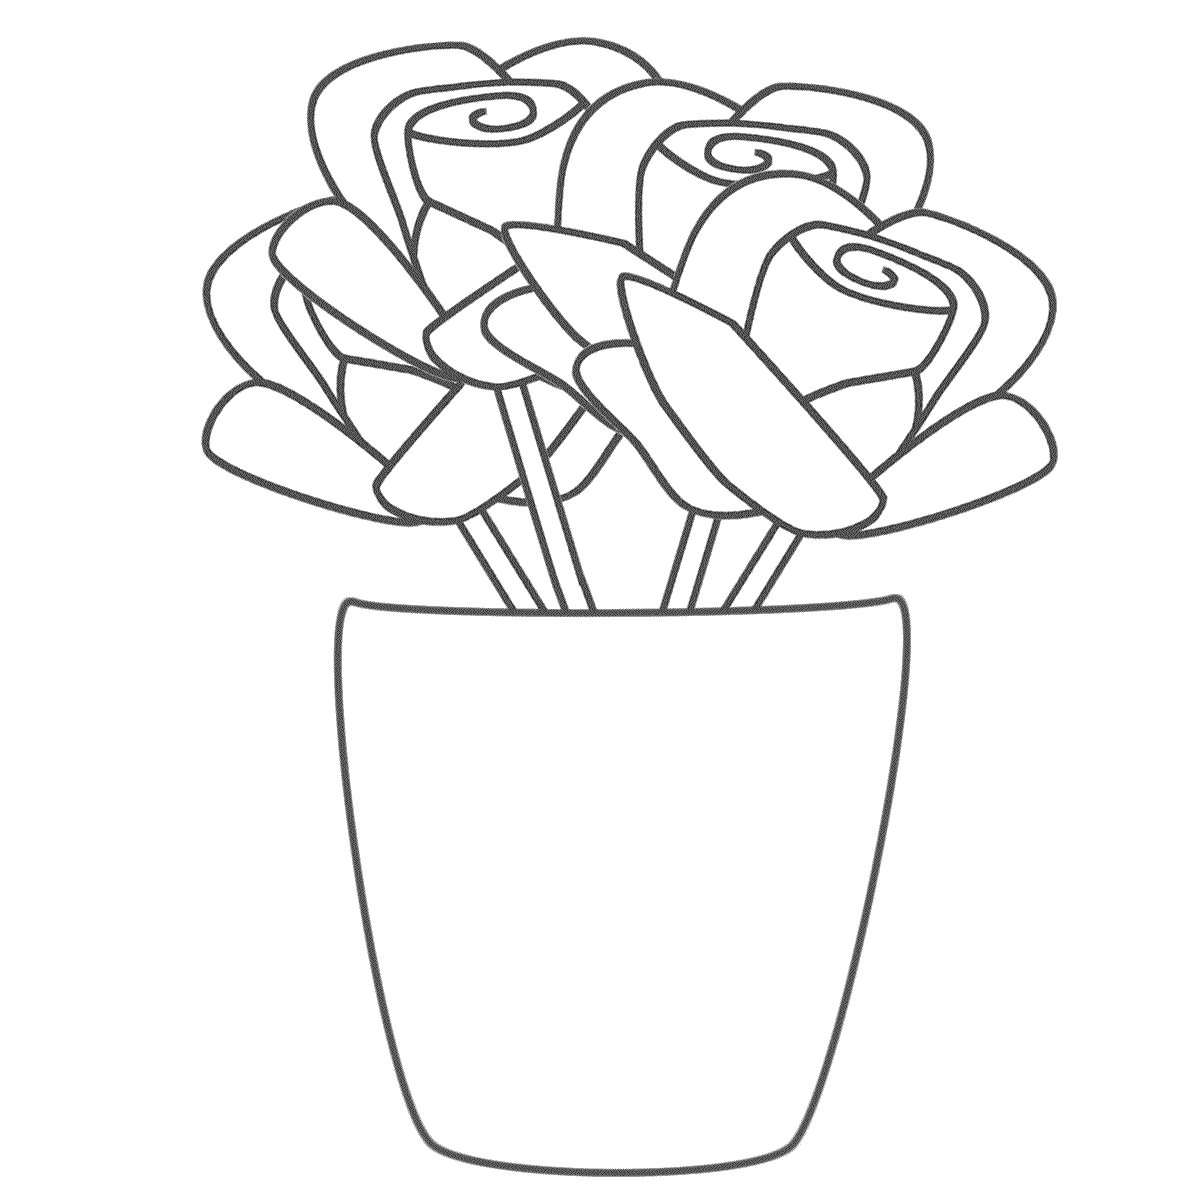 Vase coloring #19, Download drawings